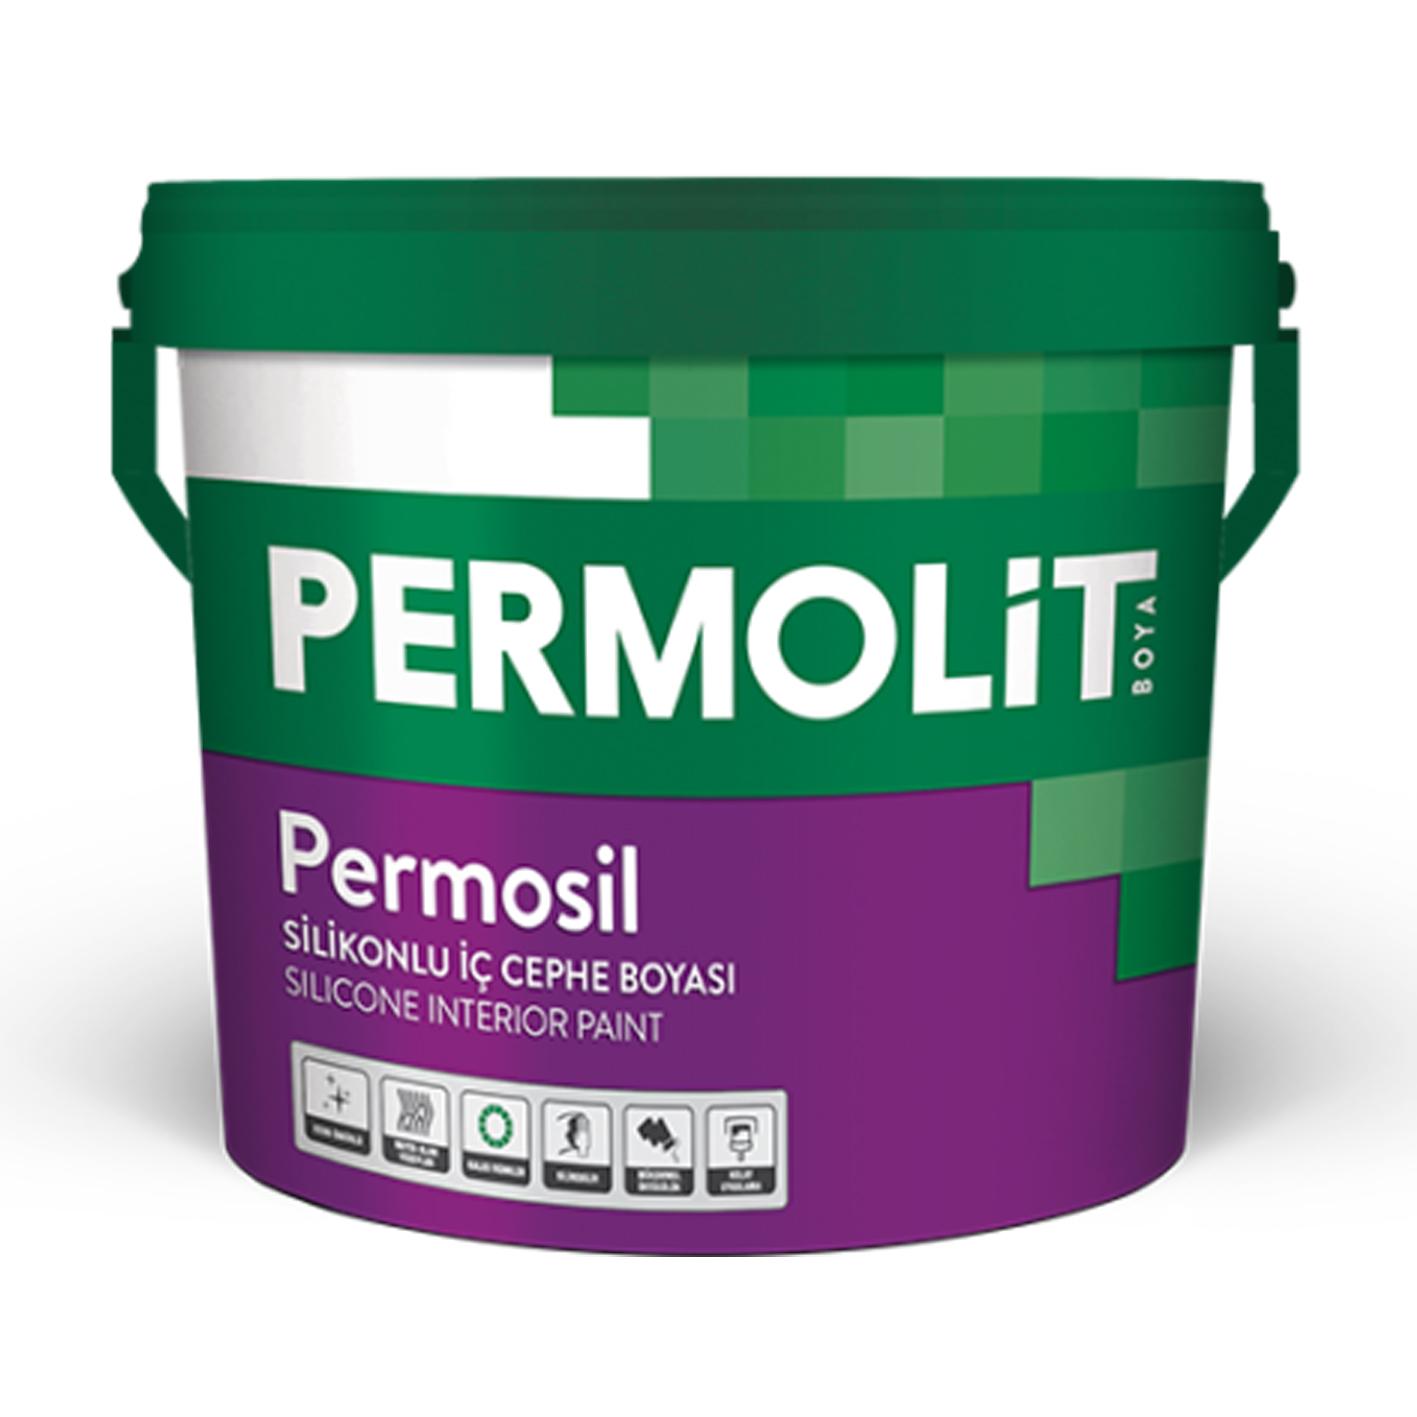 Permolit Permosil İç Cephe Fildişi 3.5Kg